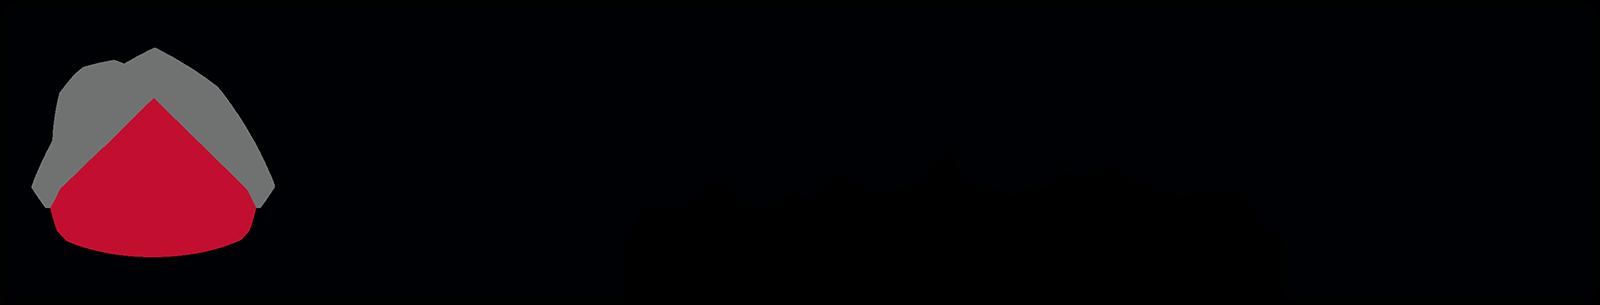 Nancy Puder & Associates